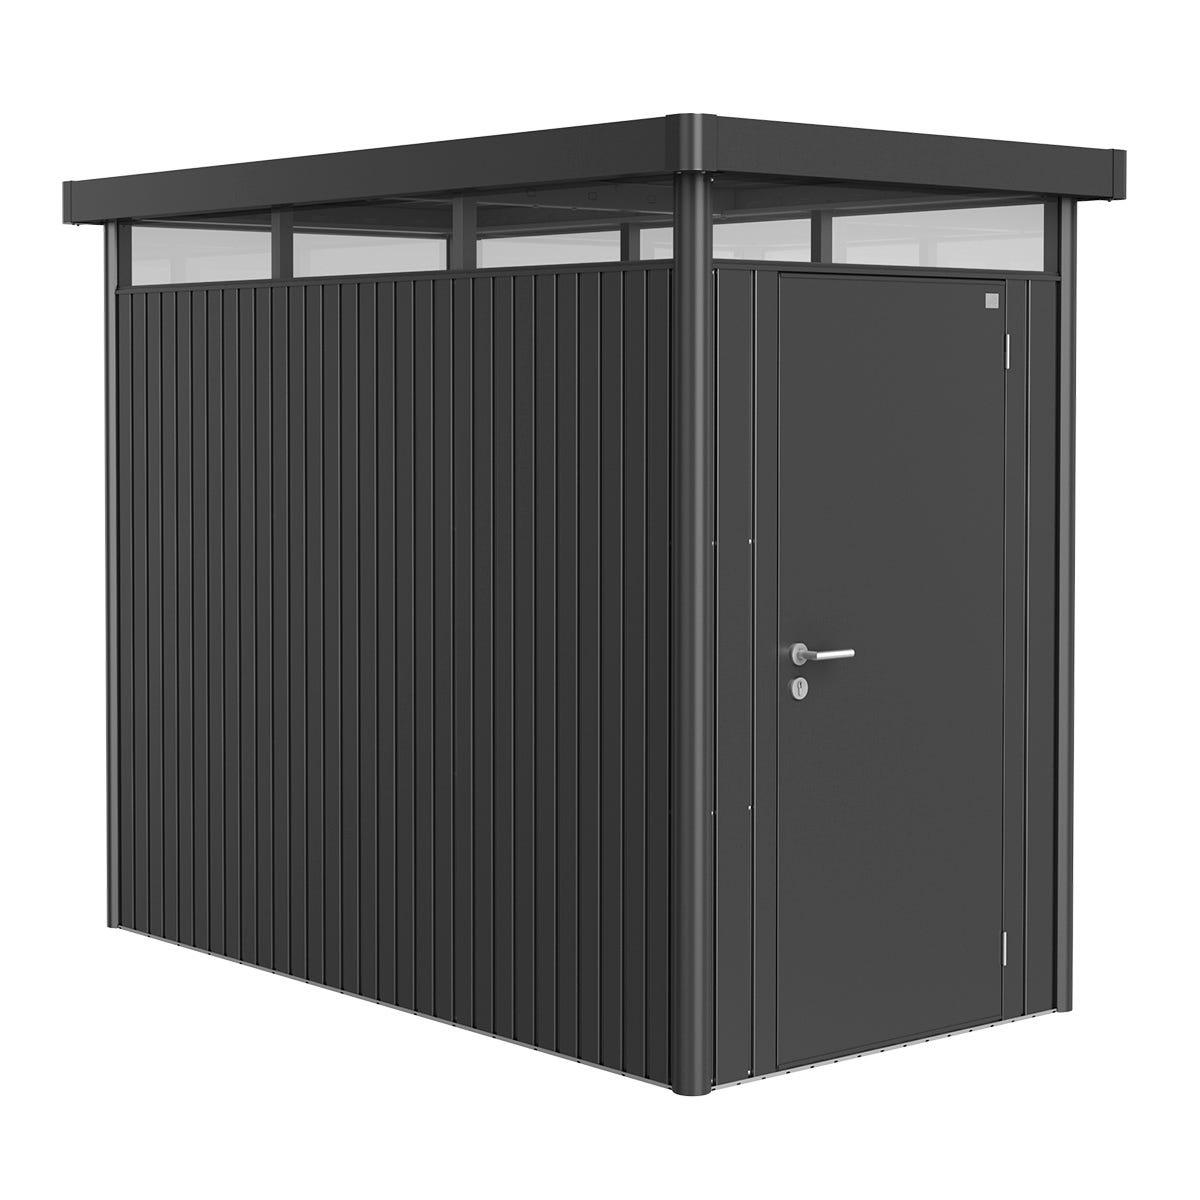 Biohort Highline Metal Shed HS Standard Door 5' x 9' - Dark Grey